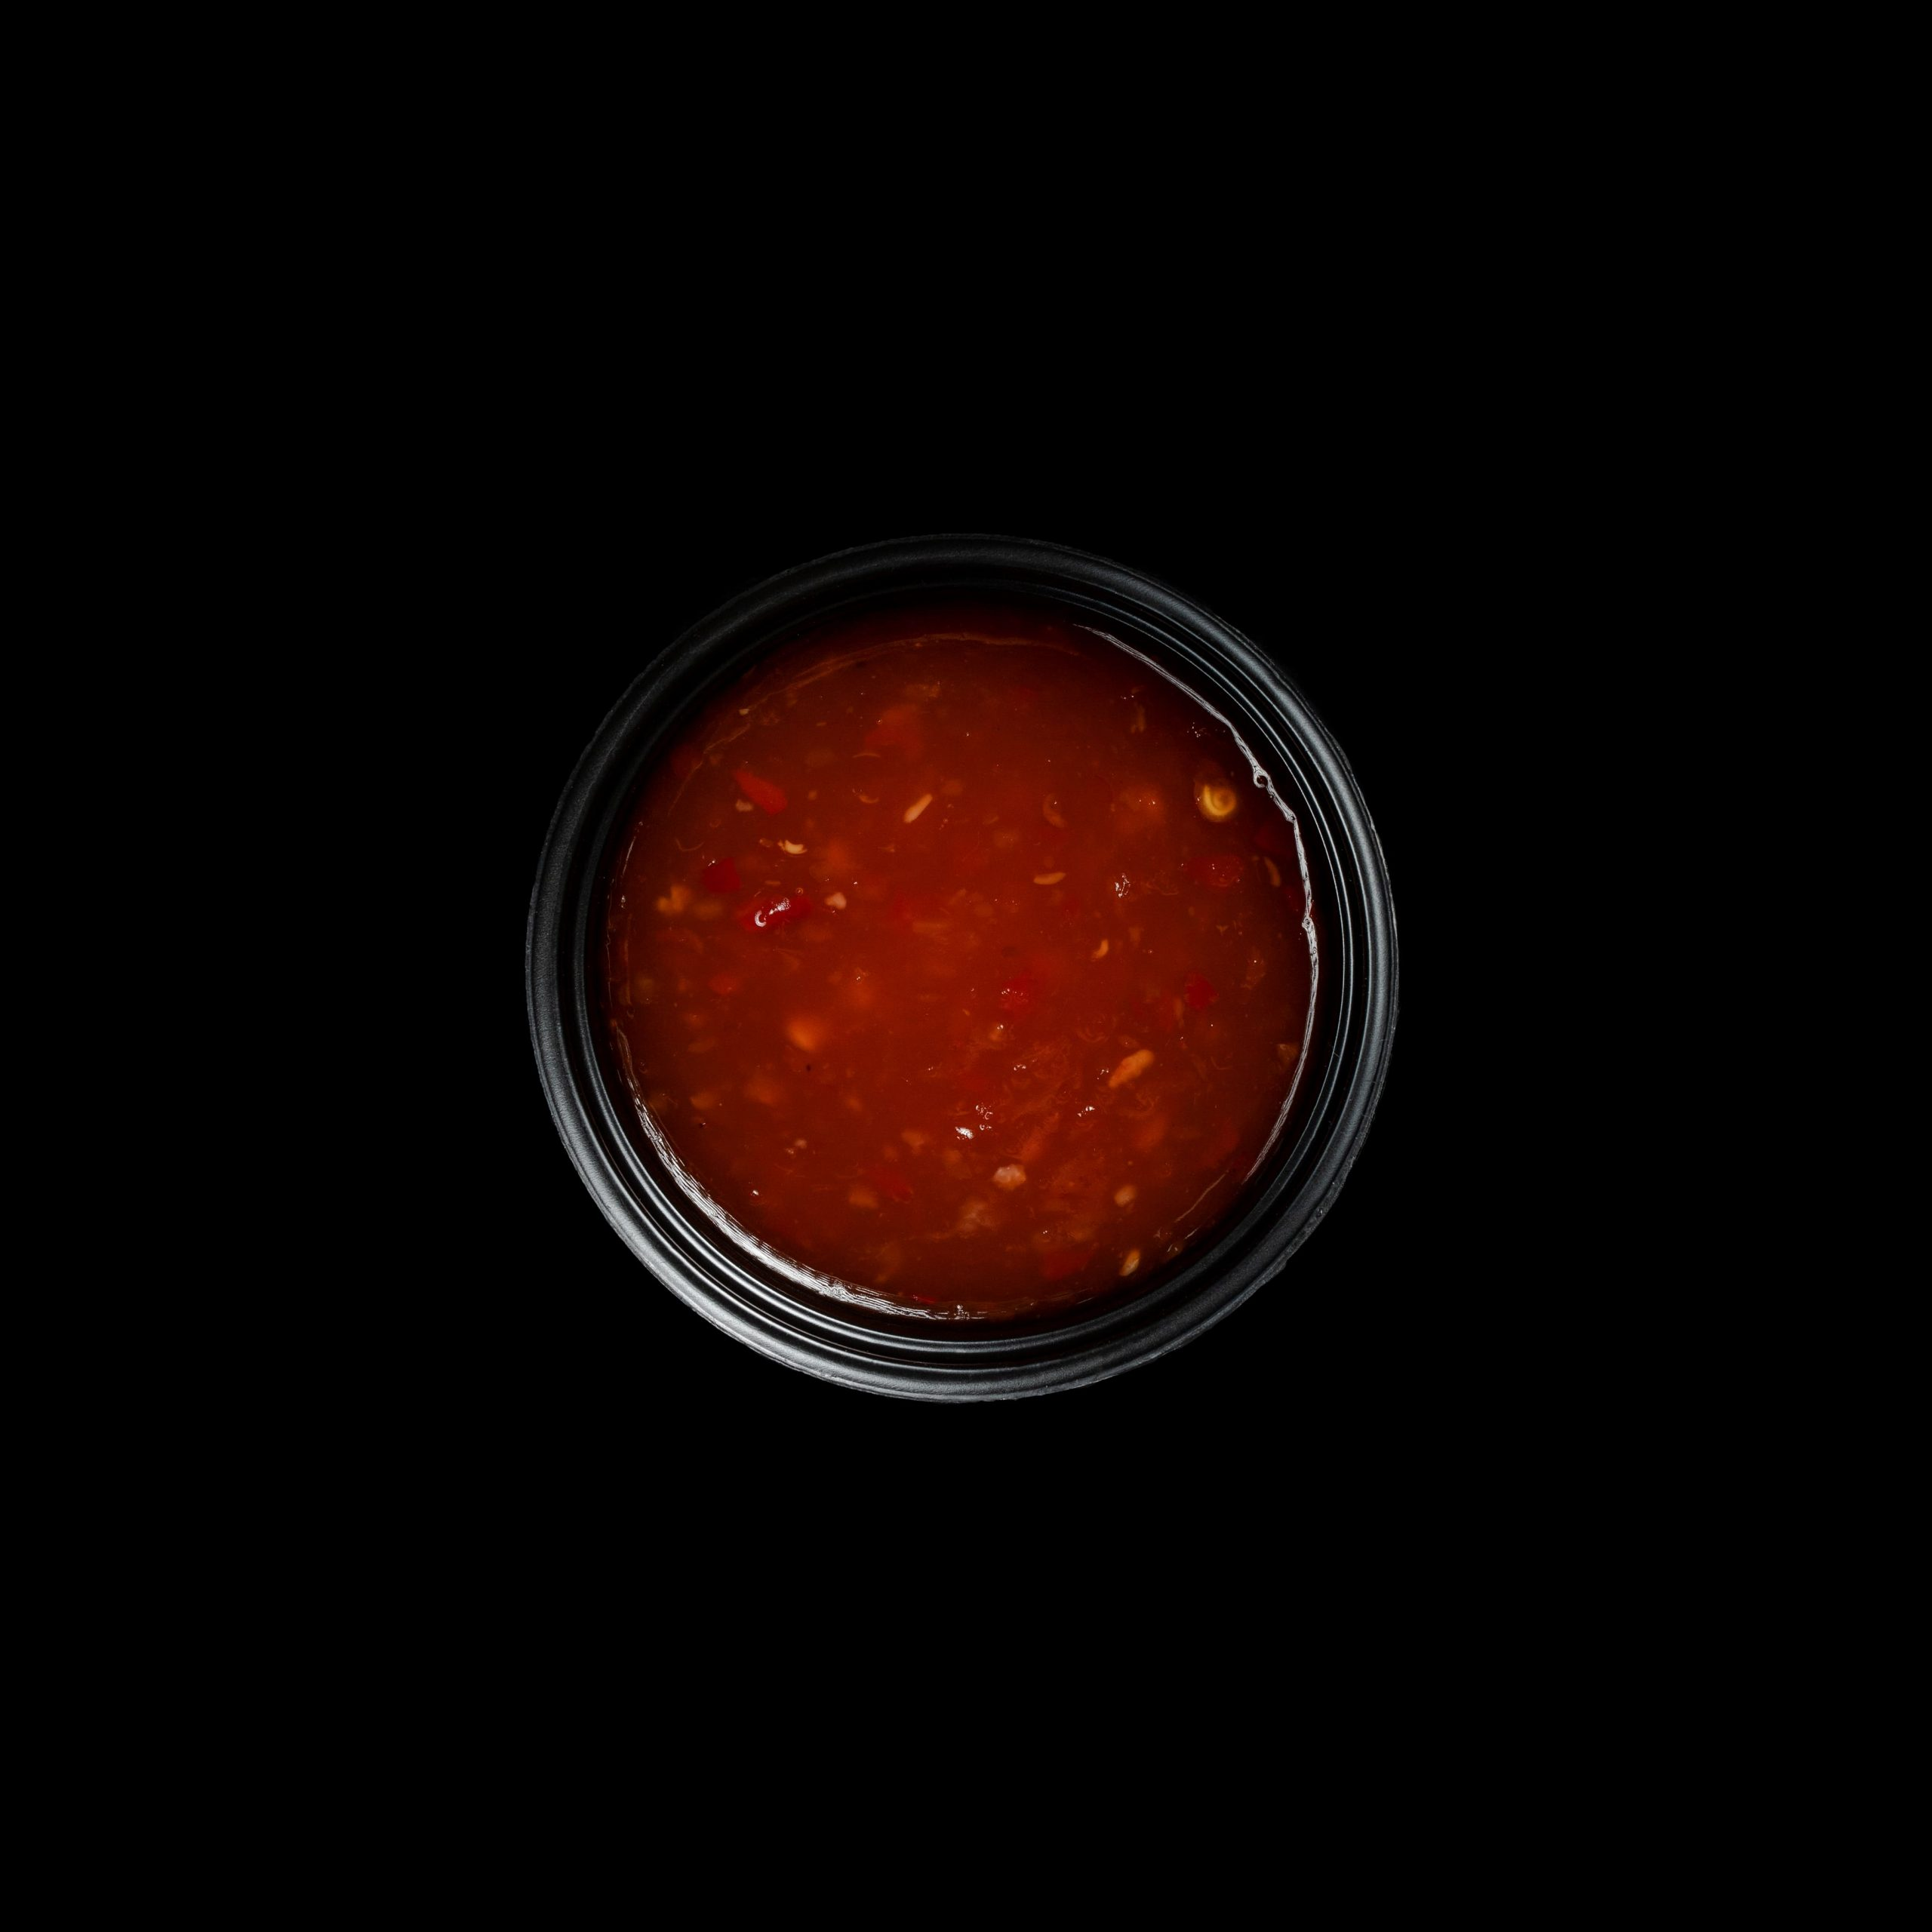 Image / Sweet chili